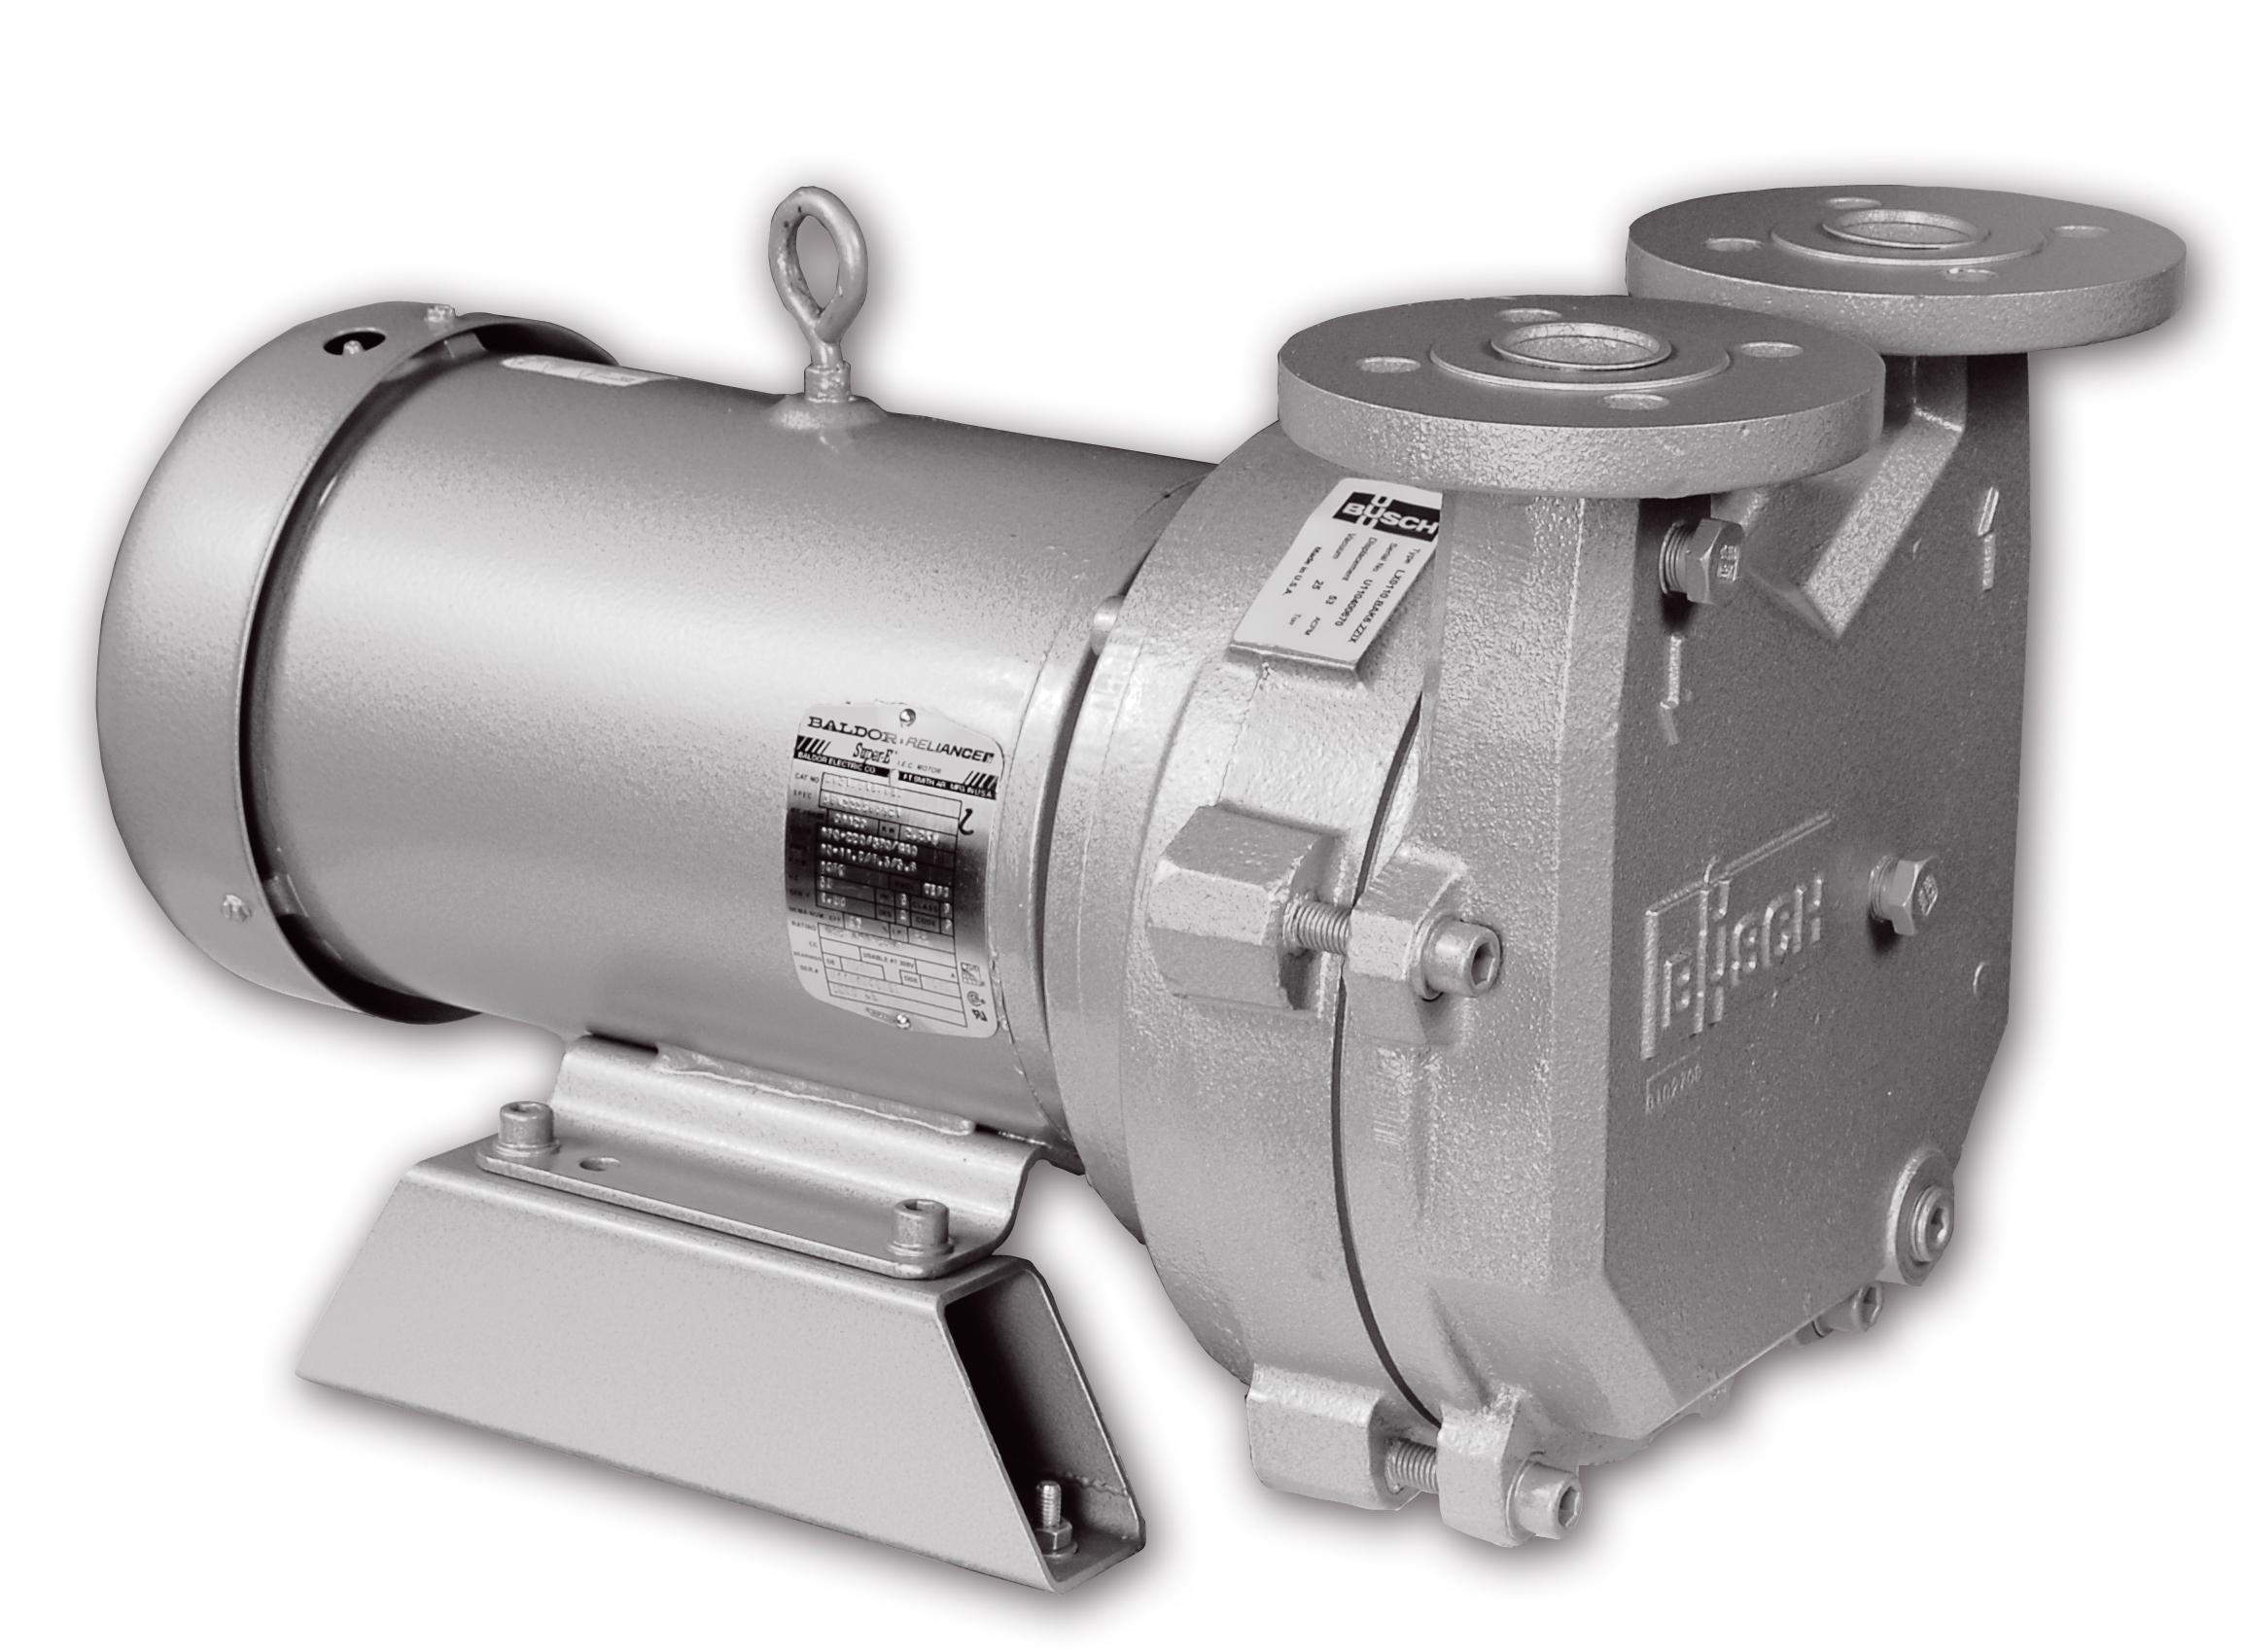 Nwe Dolphin Series Vacuum Pump Image